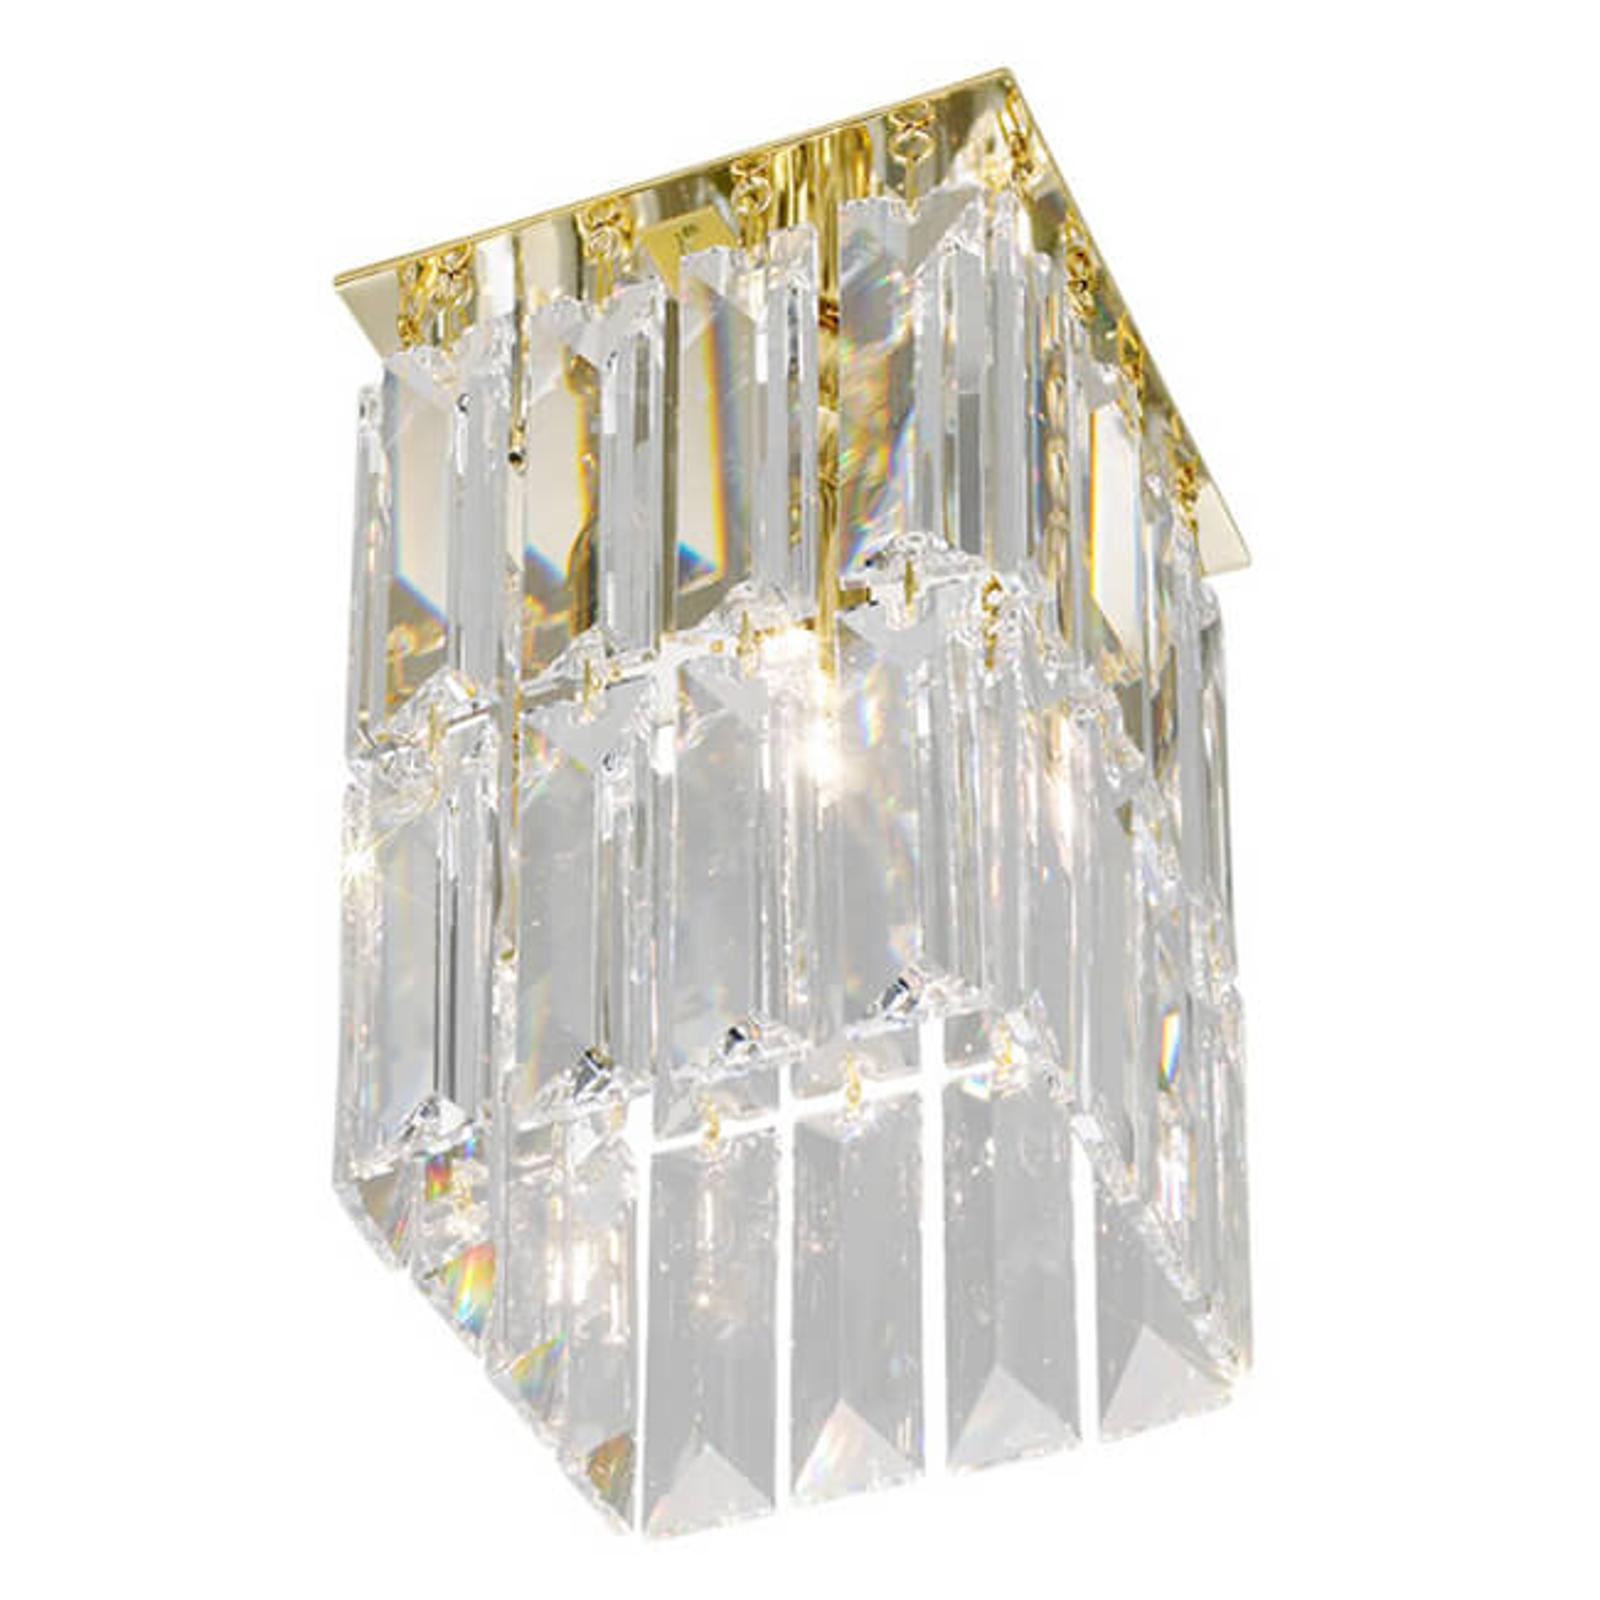 PRISMA krystall-taklampe i gull